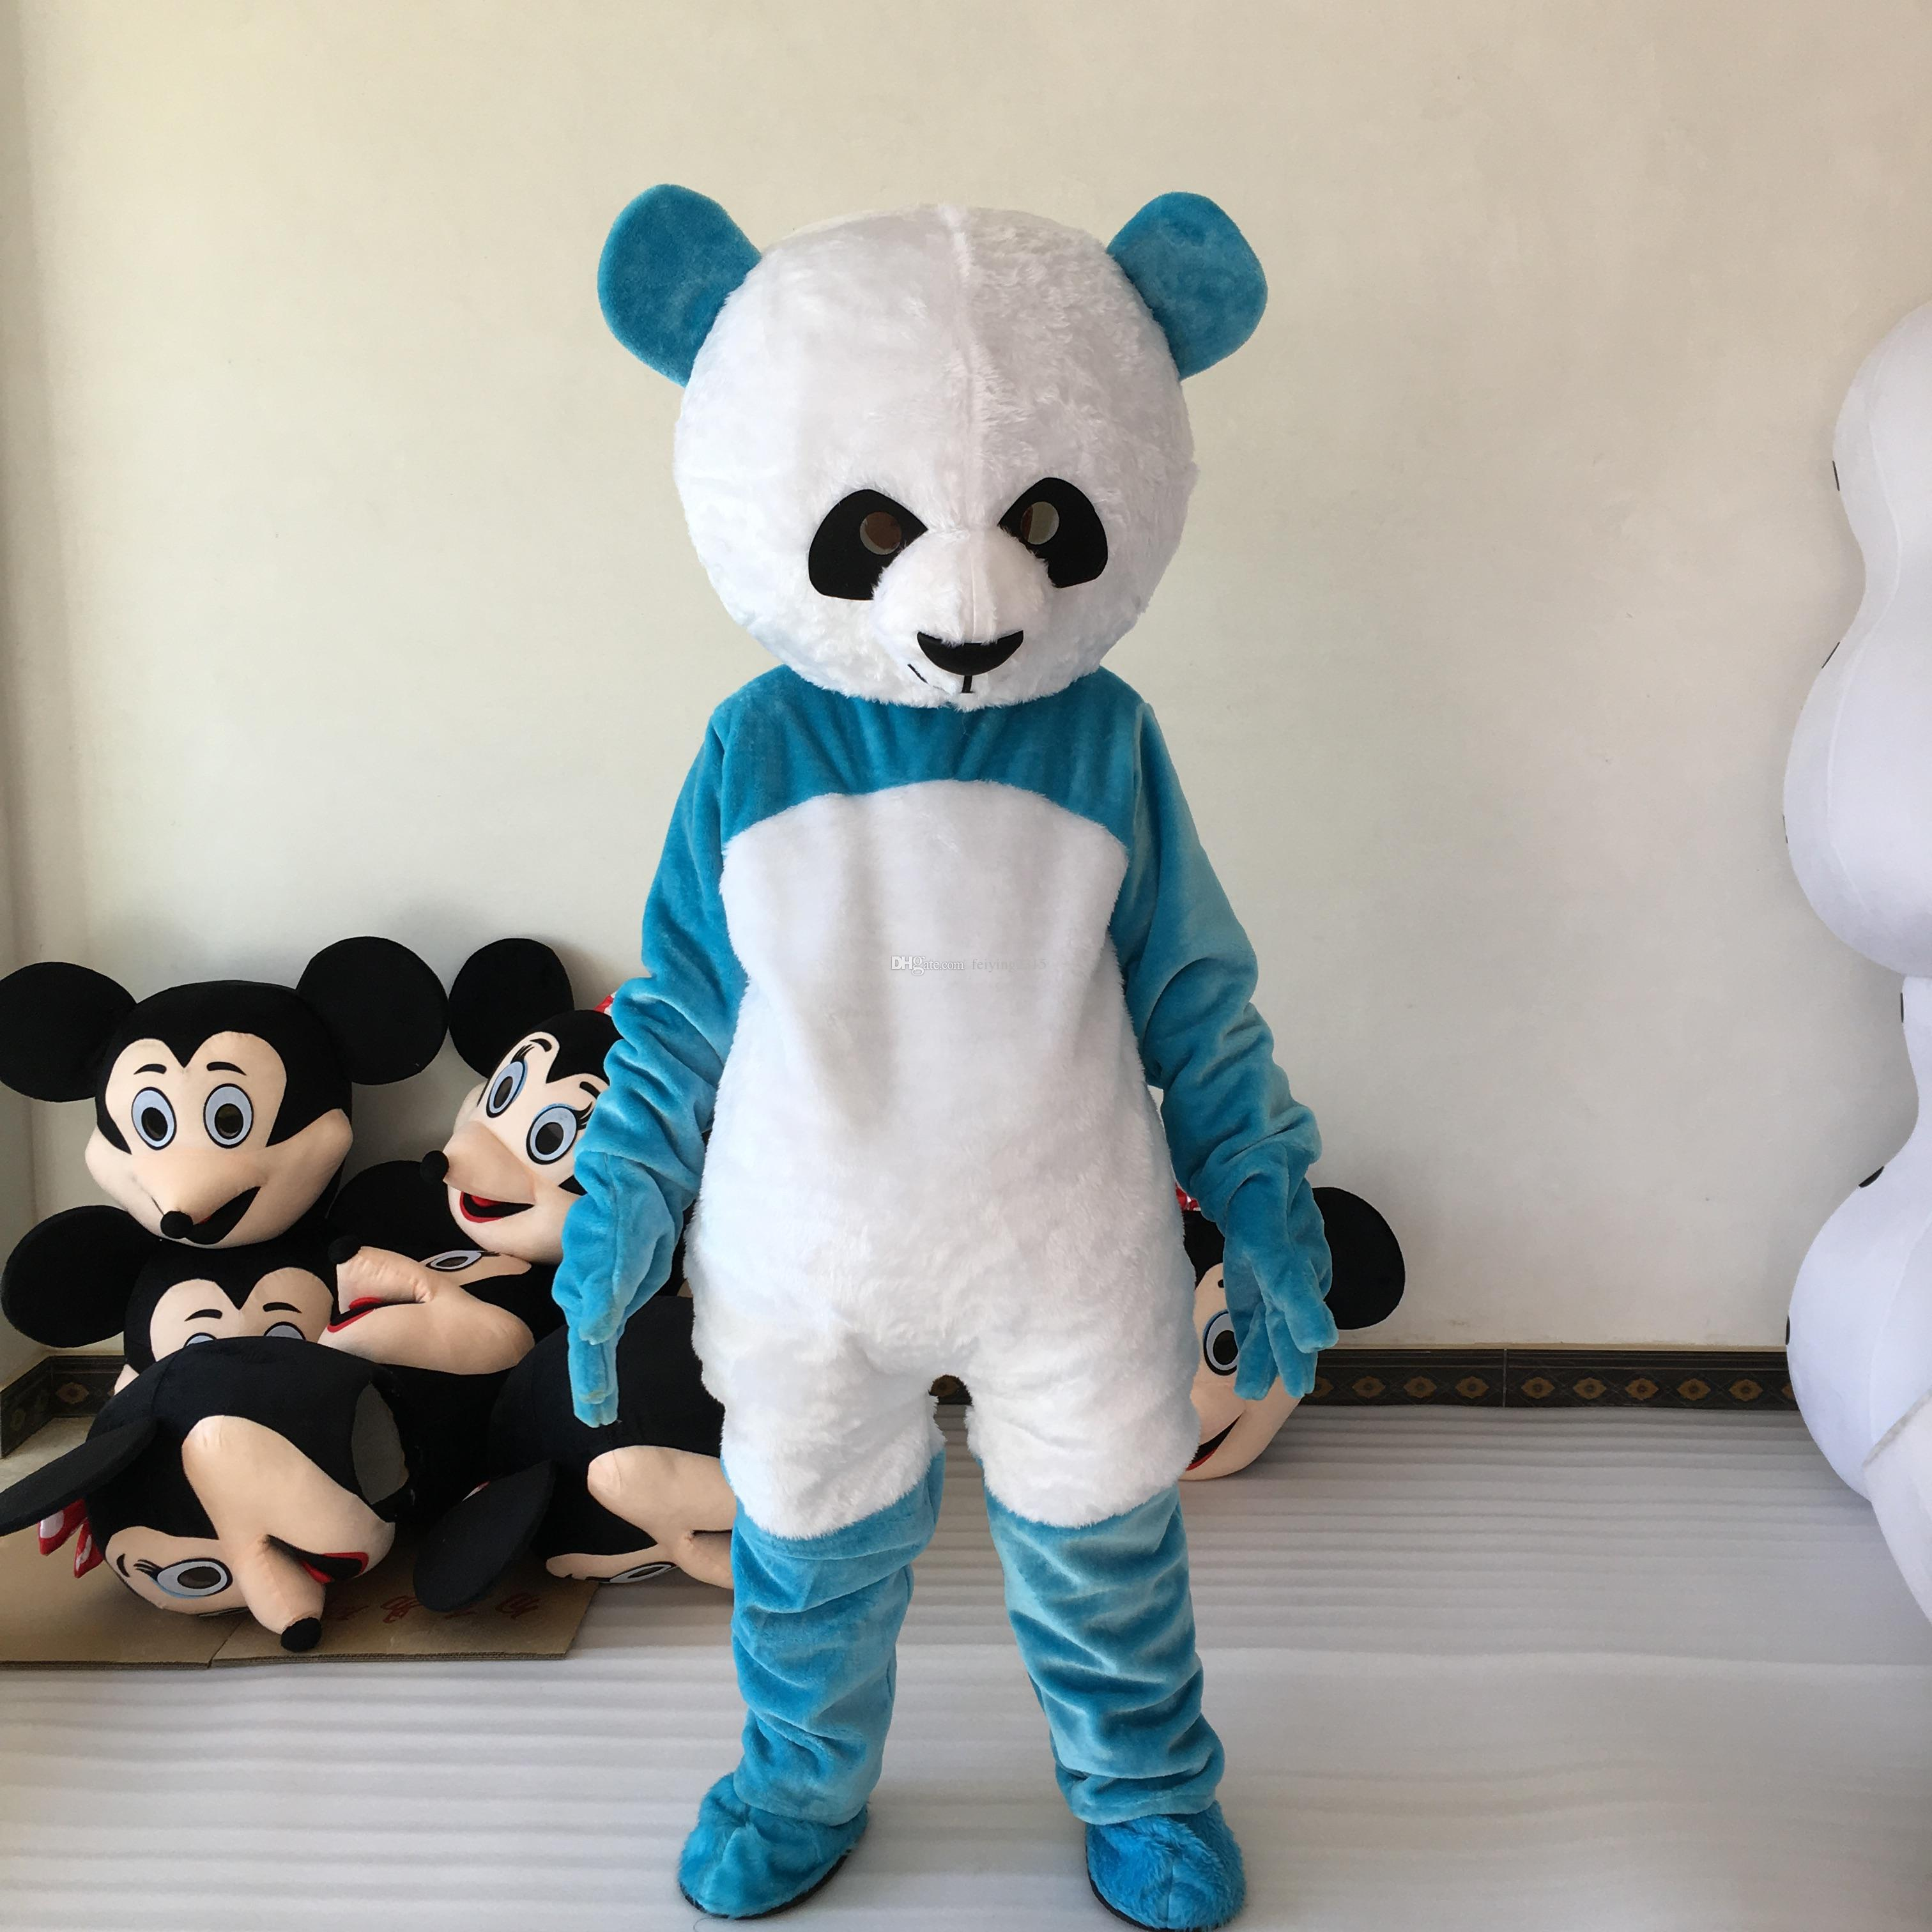 2017 Высокое качество продажи синий панда талисман костюм Рождество  Хэллоуин животное смешно медведь талисман костюм костюм взрослый размер 943a138e6f701